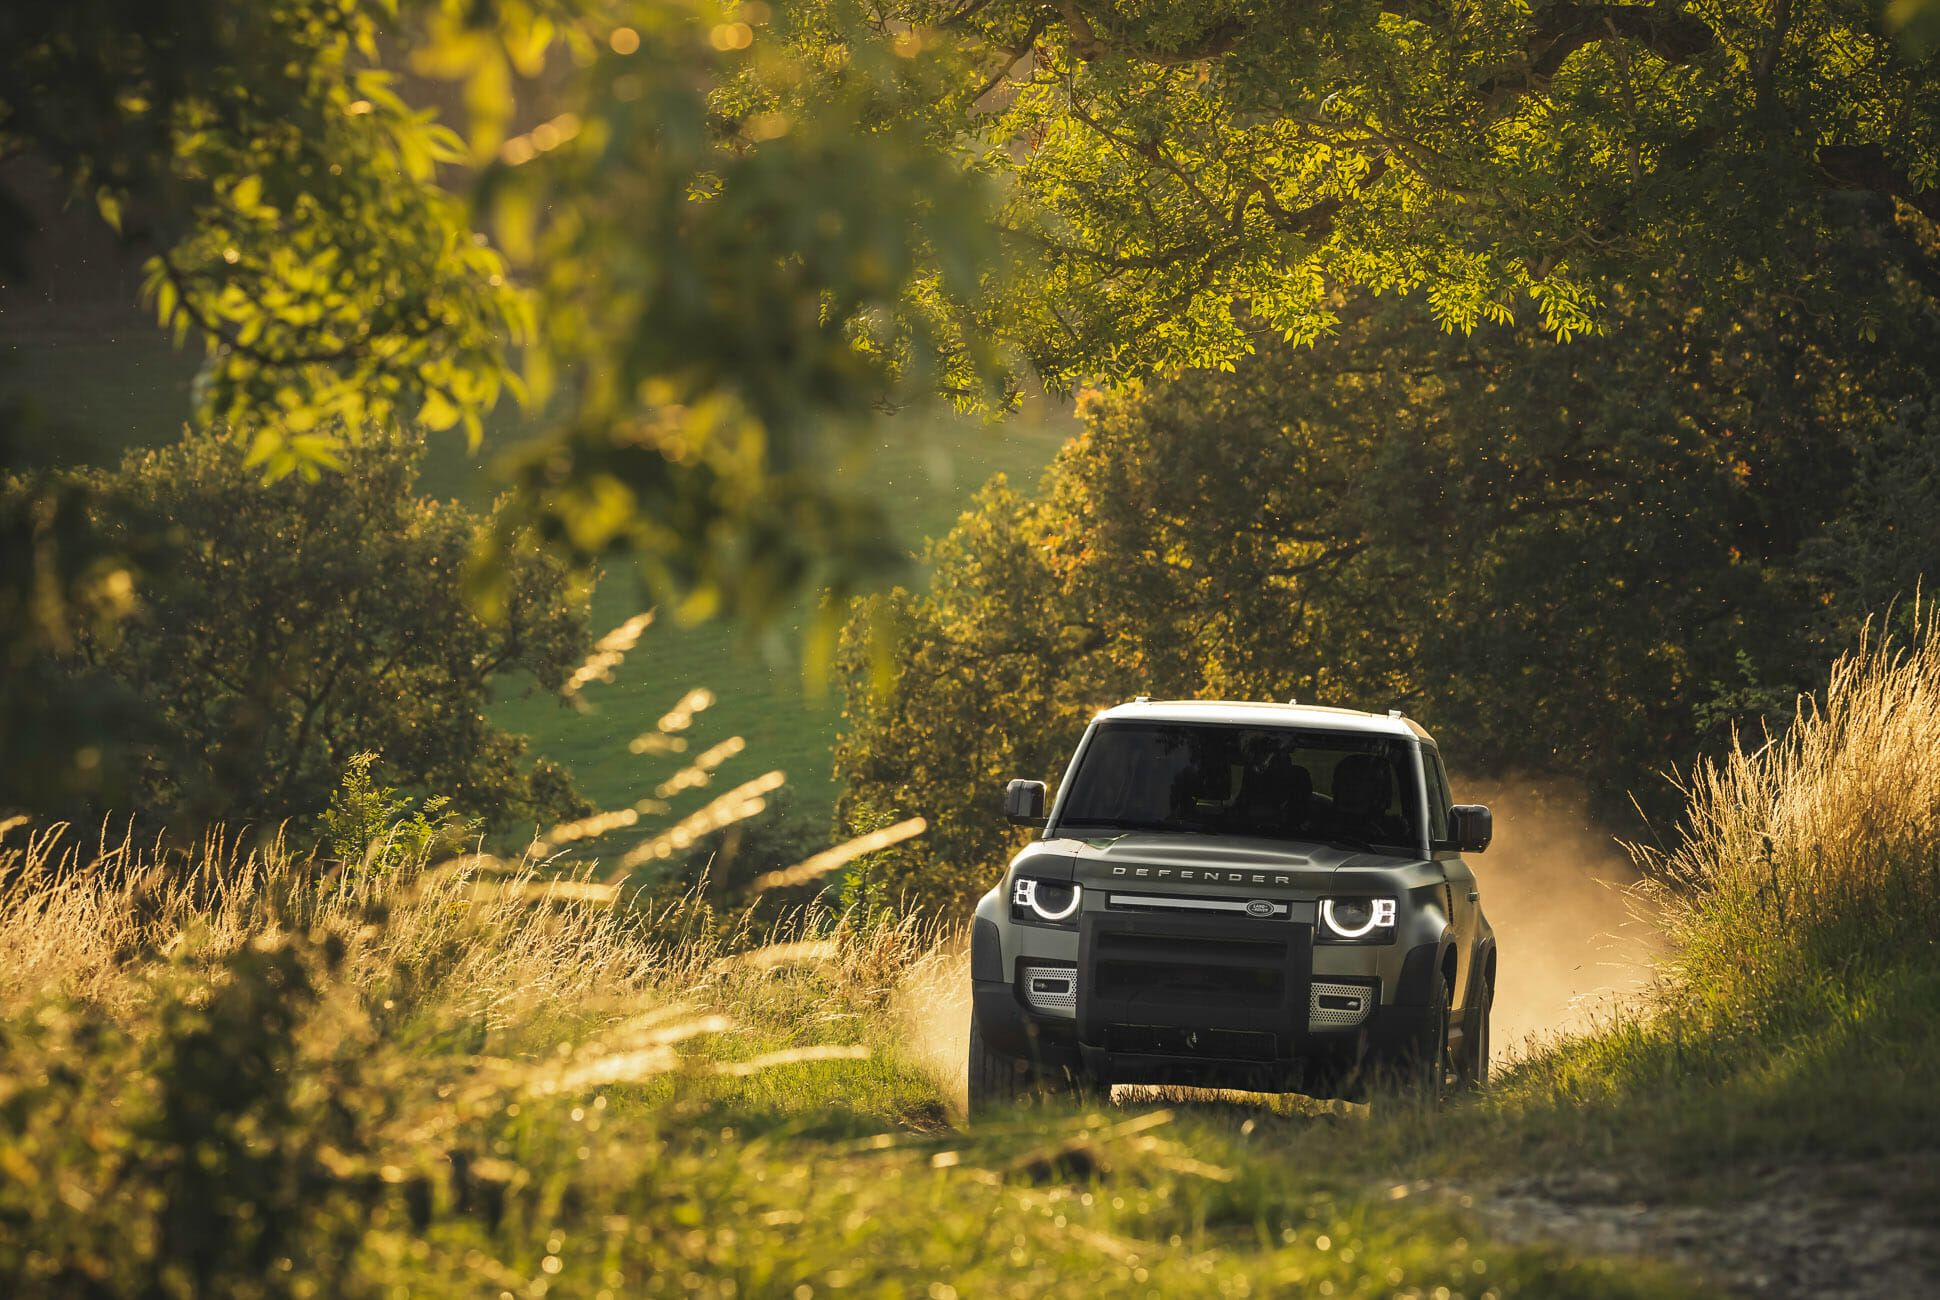 Land Rover Defender Gear Patrol-Exterior Action-Slide-11